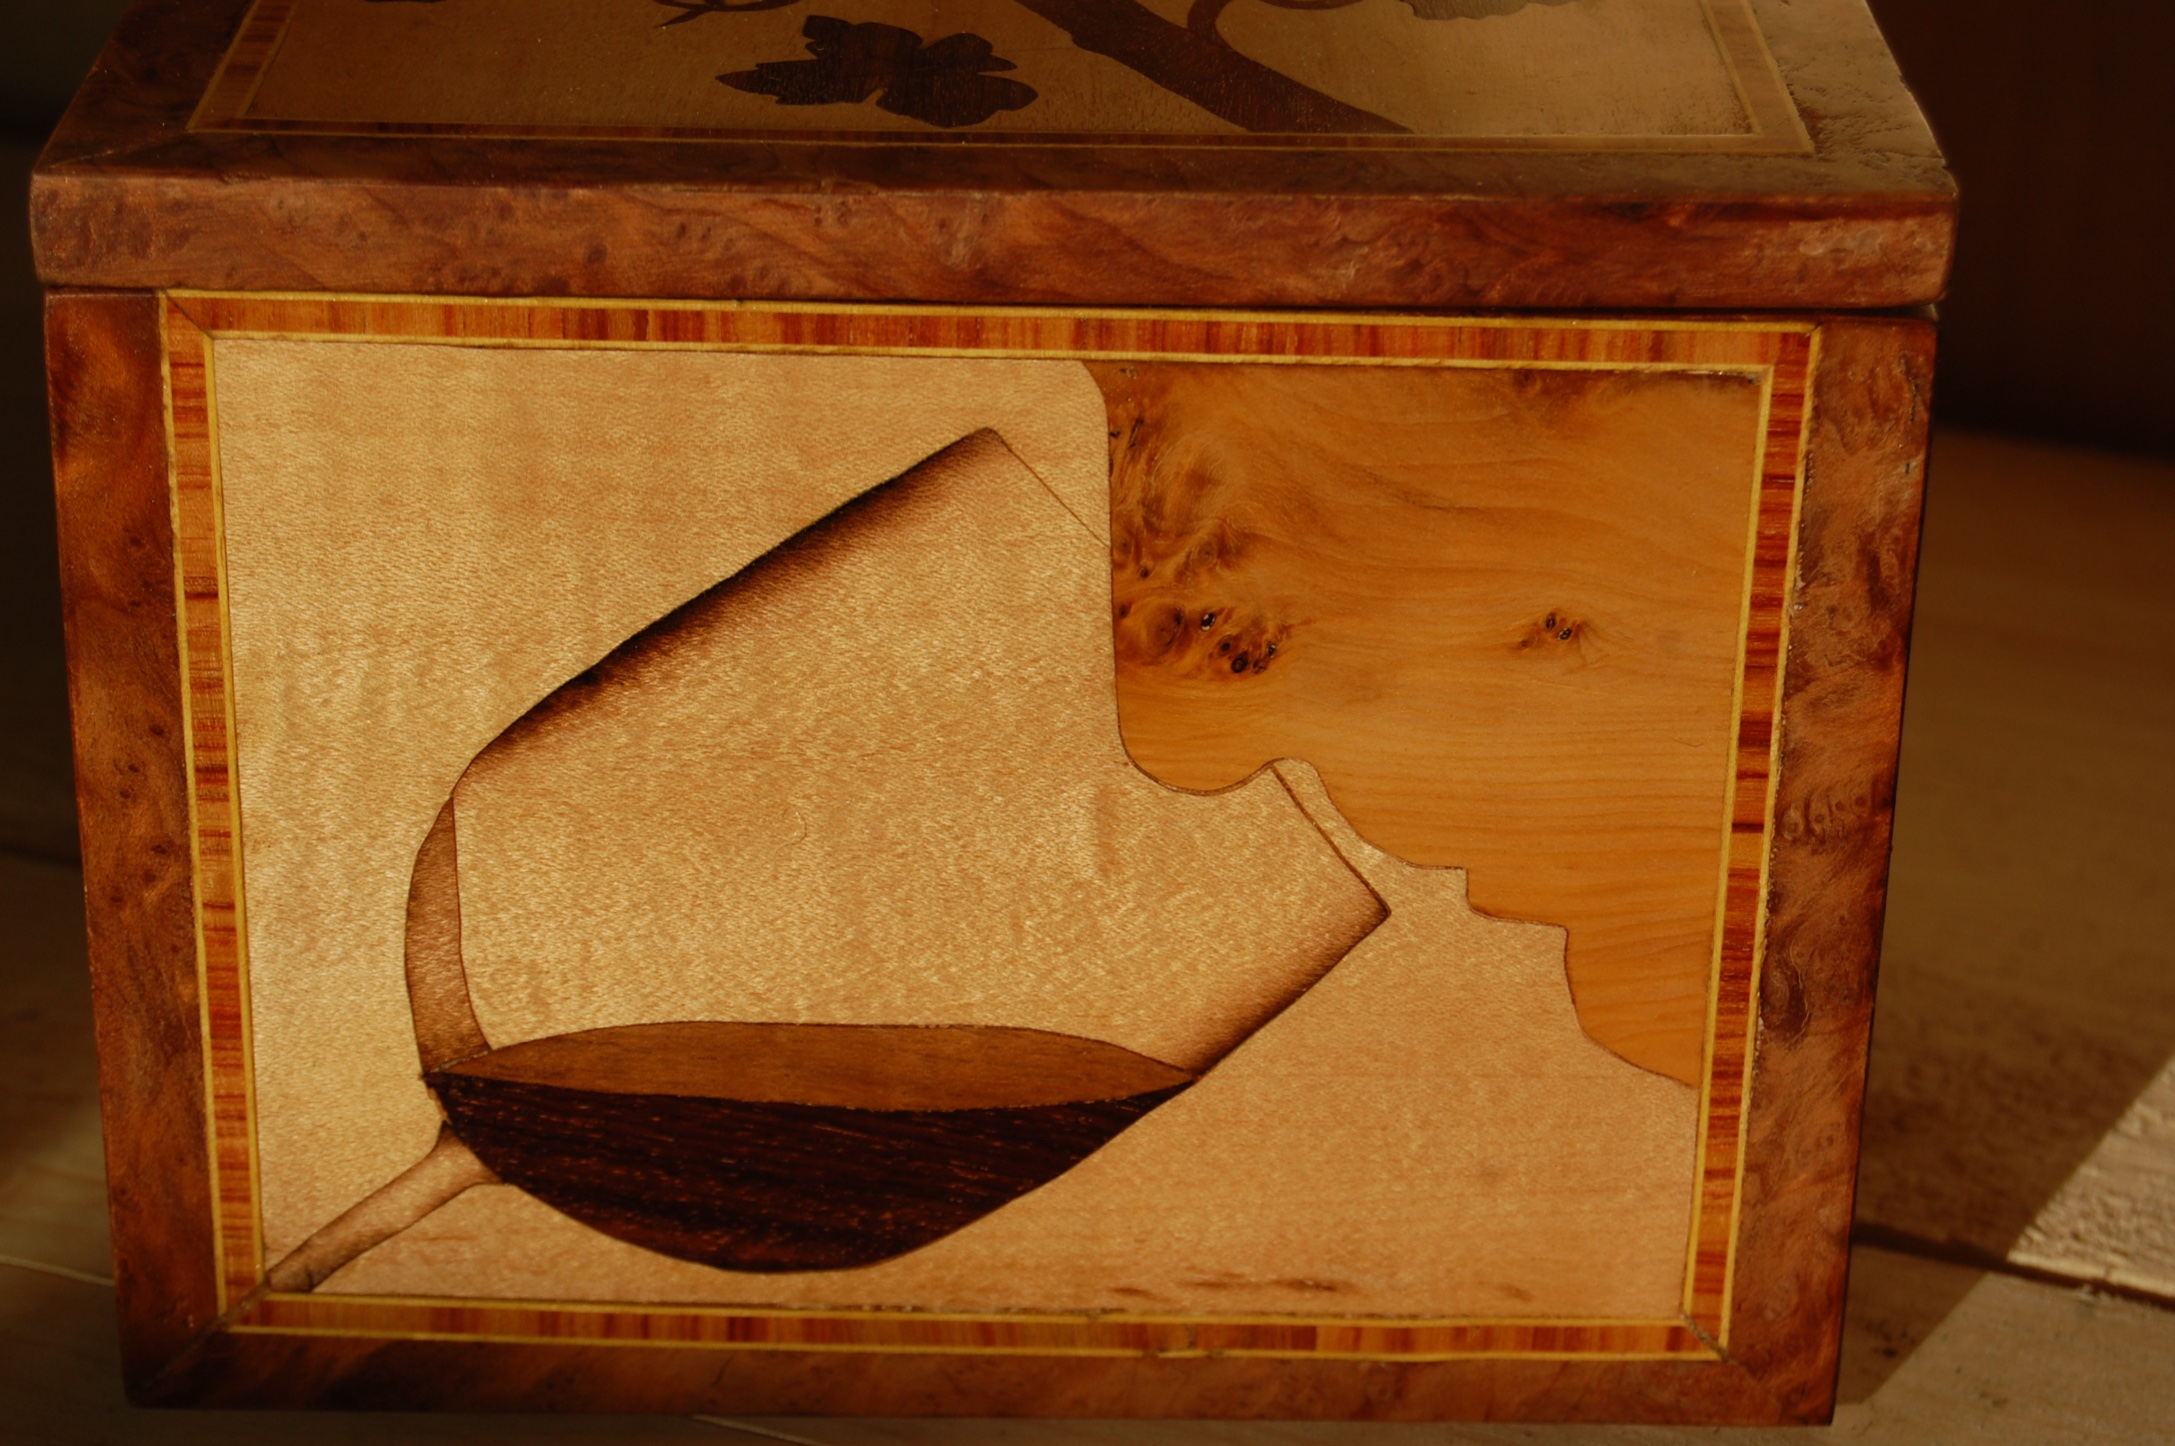 11 juwelenkistje ambachtelijk houtwerk thomas huyghe wortegem